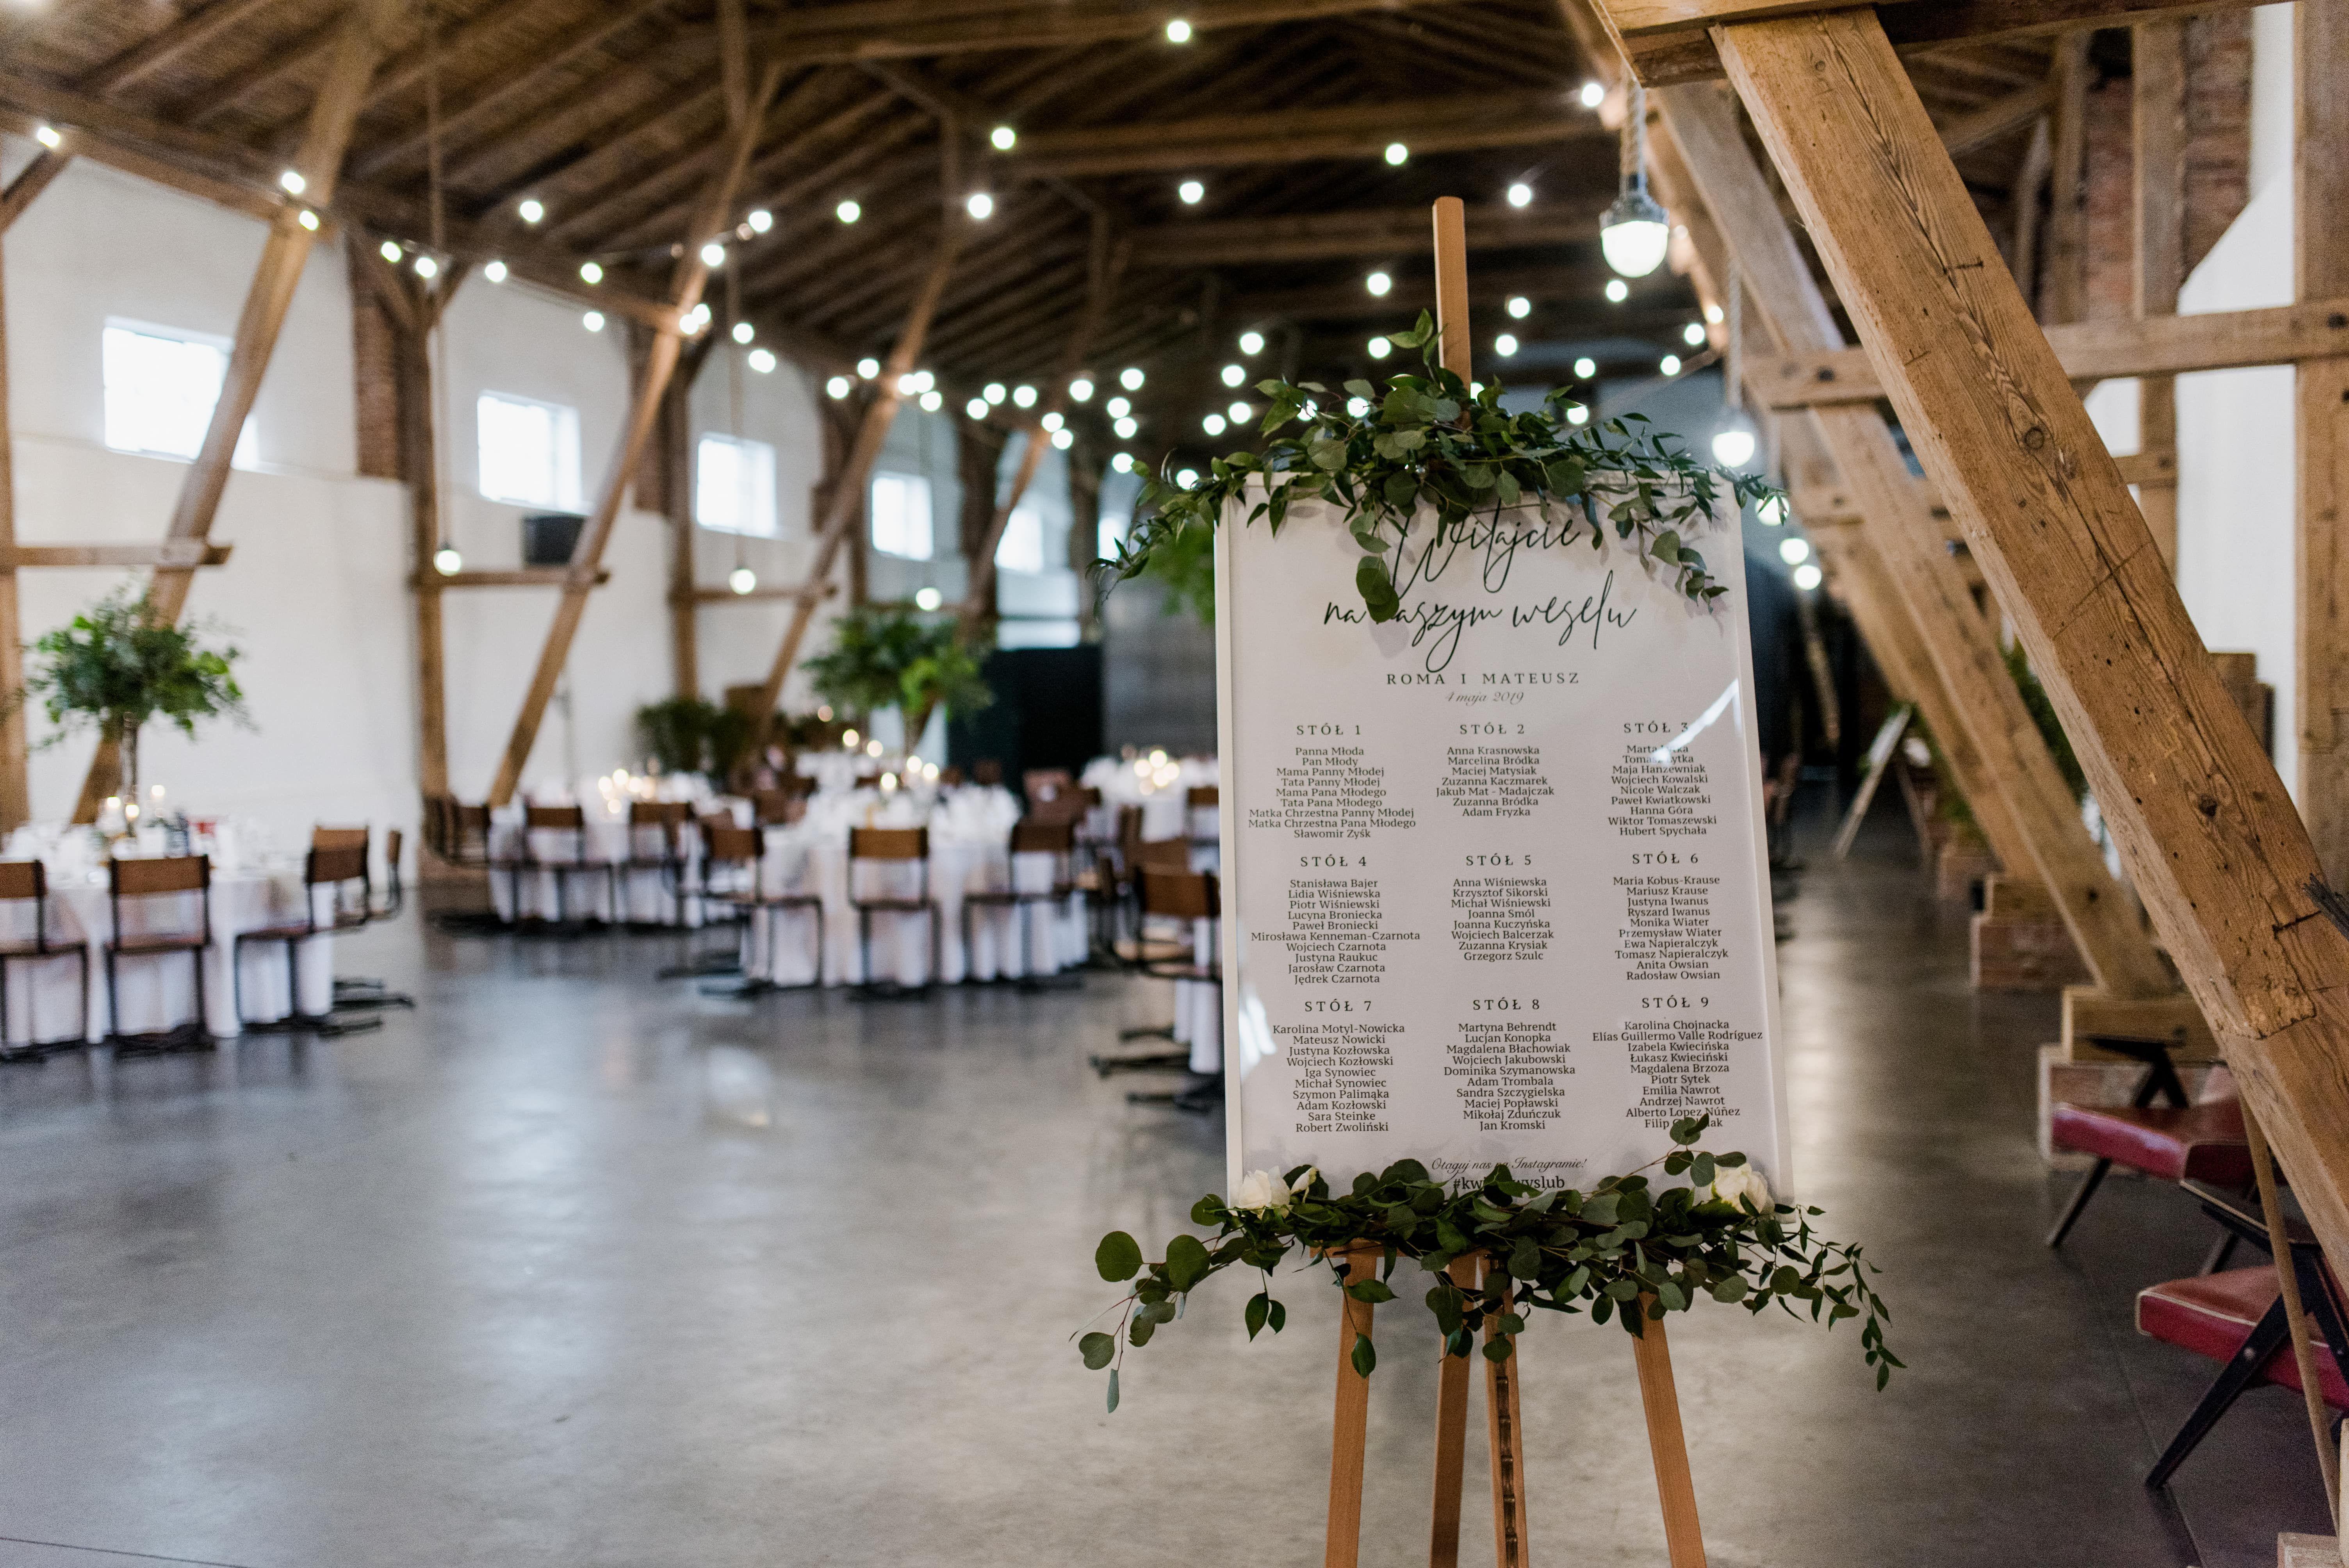 Inna Studio Green Decoration For A Wedding Green Theme For A Wedding Wedding In A Barn Natural Compositio W 2020 Slub Wesele W Stodole I Fotografia